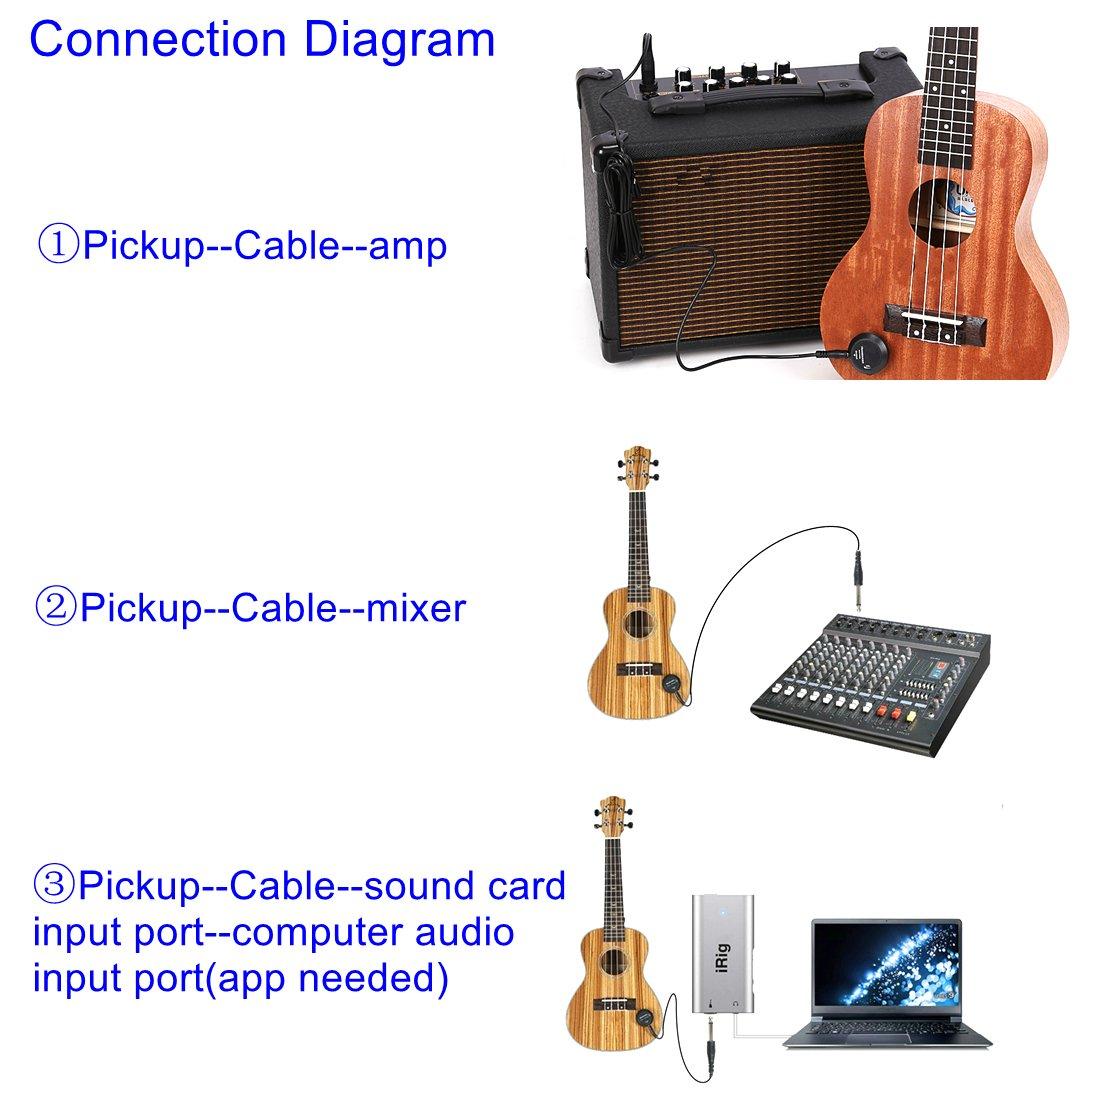 Luvay Acoustic Guitar Pickup, contacto con micrófono piezo transductor para guitarra acústica, ukelele, mandolina, banjo, violin, violonchelo, Kalimba, etc.